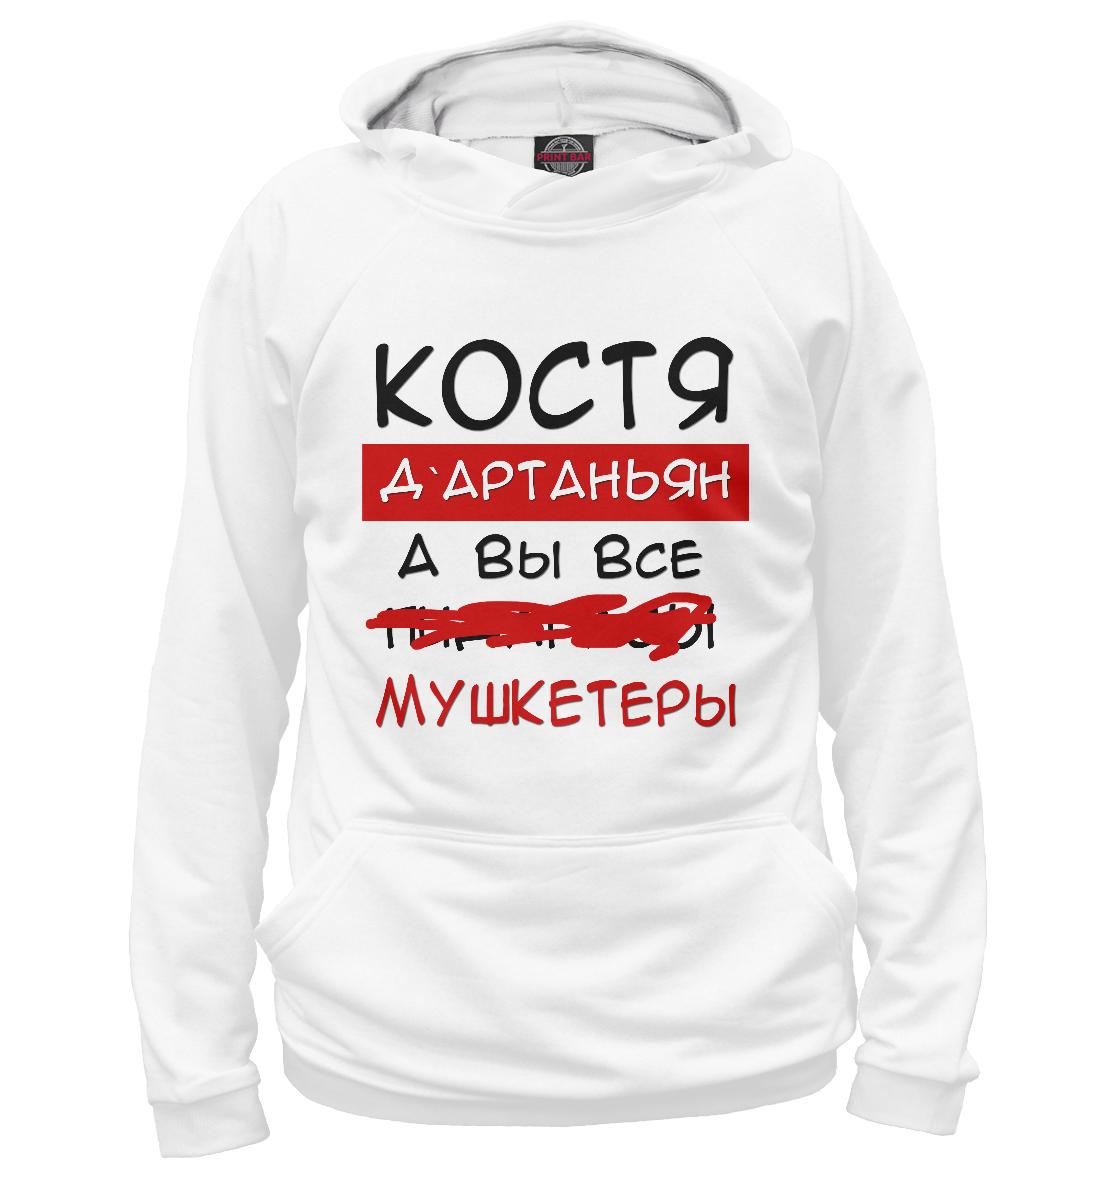 Купить Костя Дартаньян, Printbar, Худи, KST-345151-hud